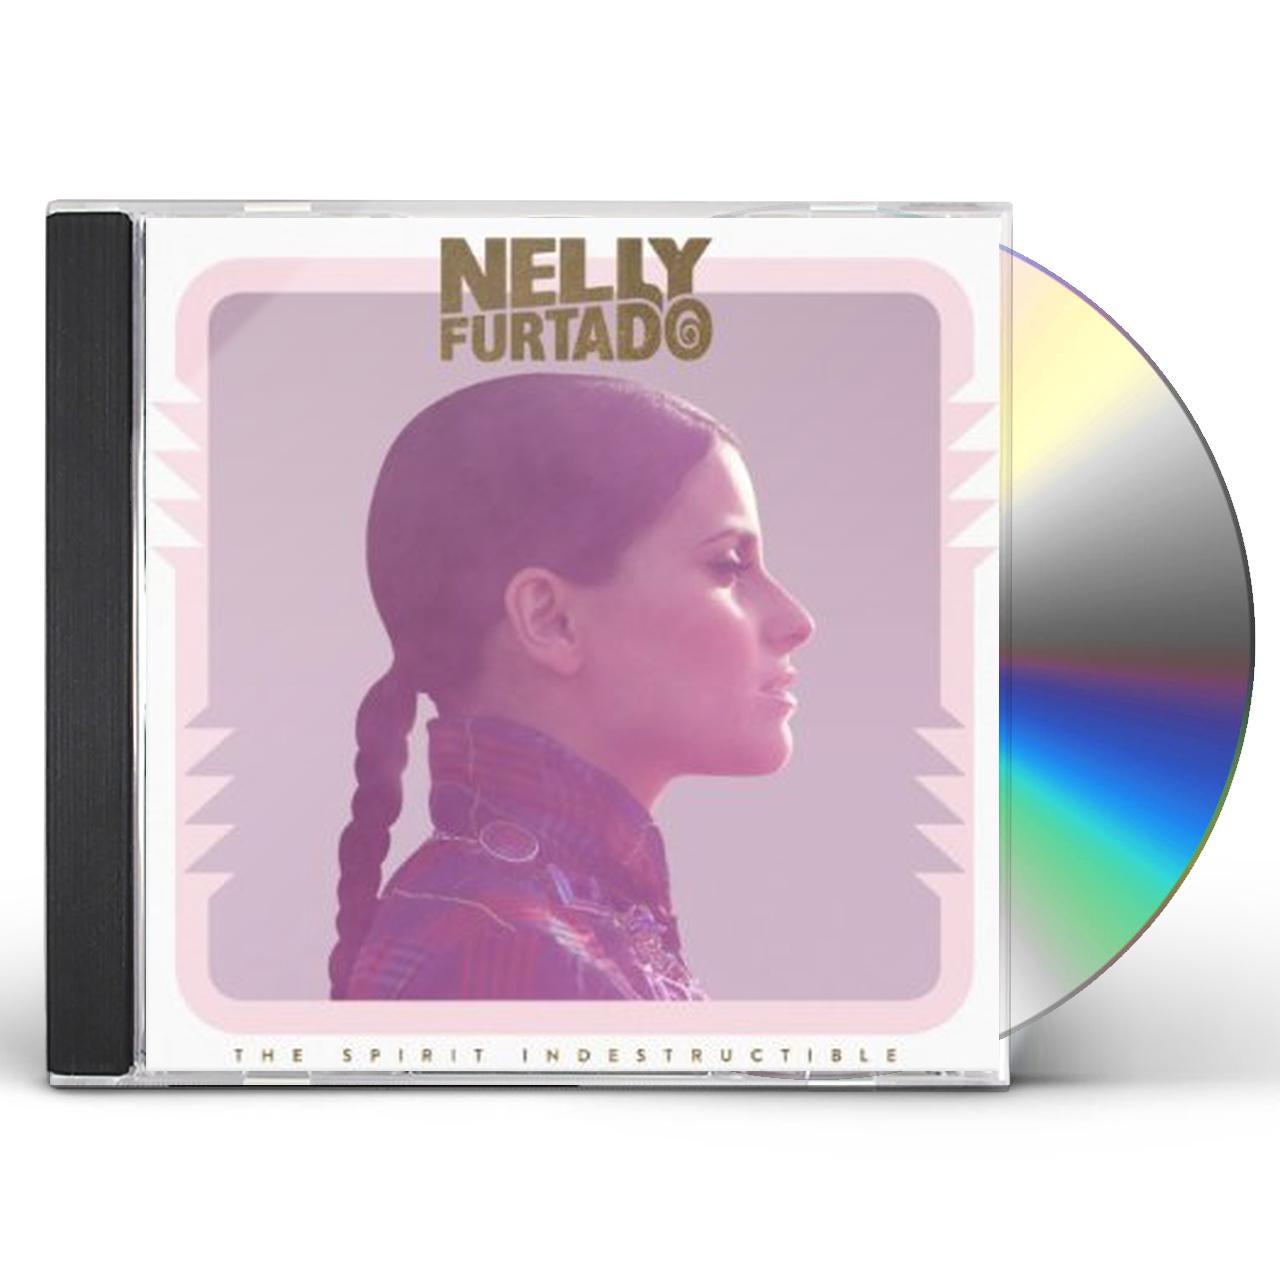 Nelly Furtado - CD The Spirit Indestructible